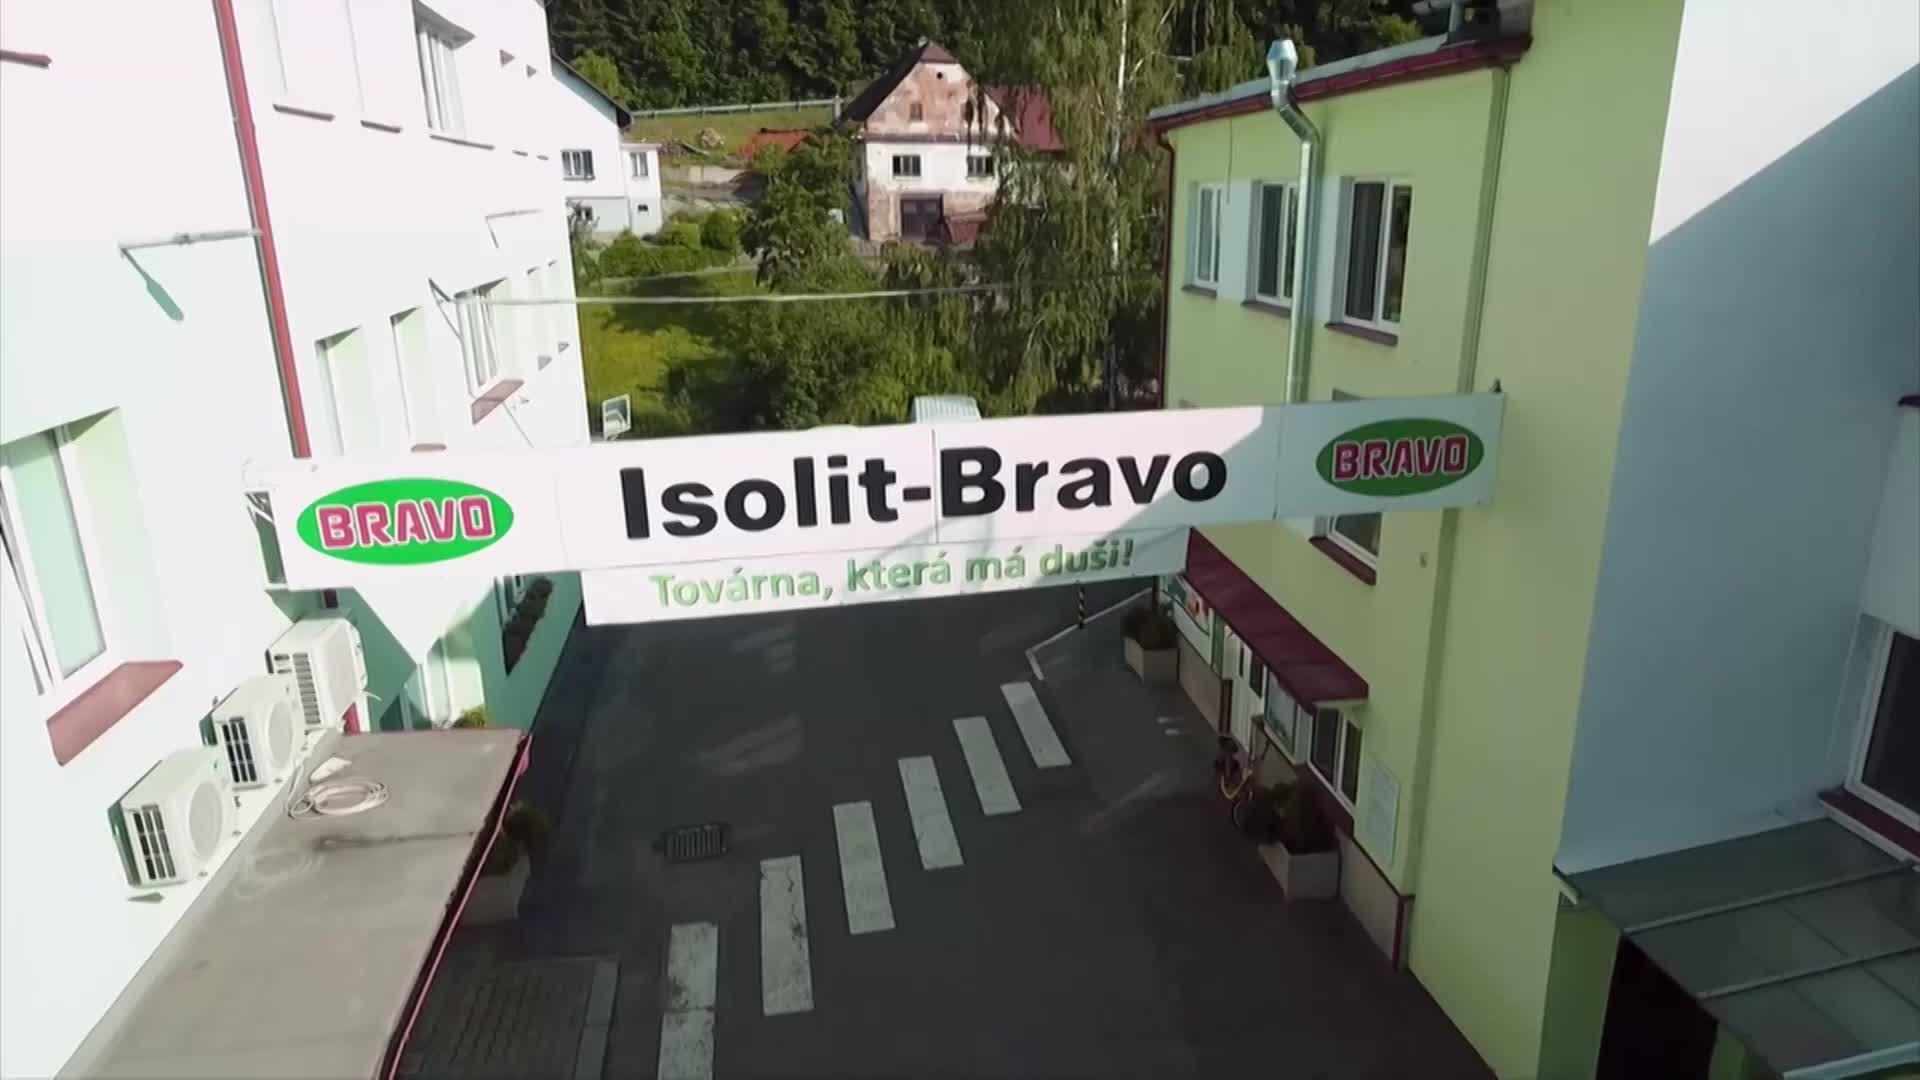 Isolit_Bravo